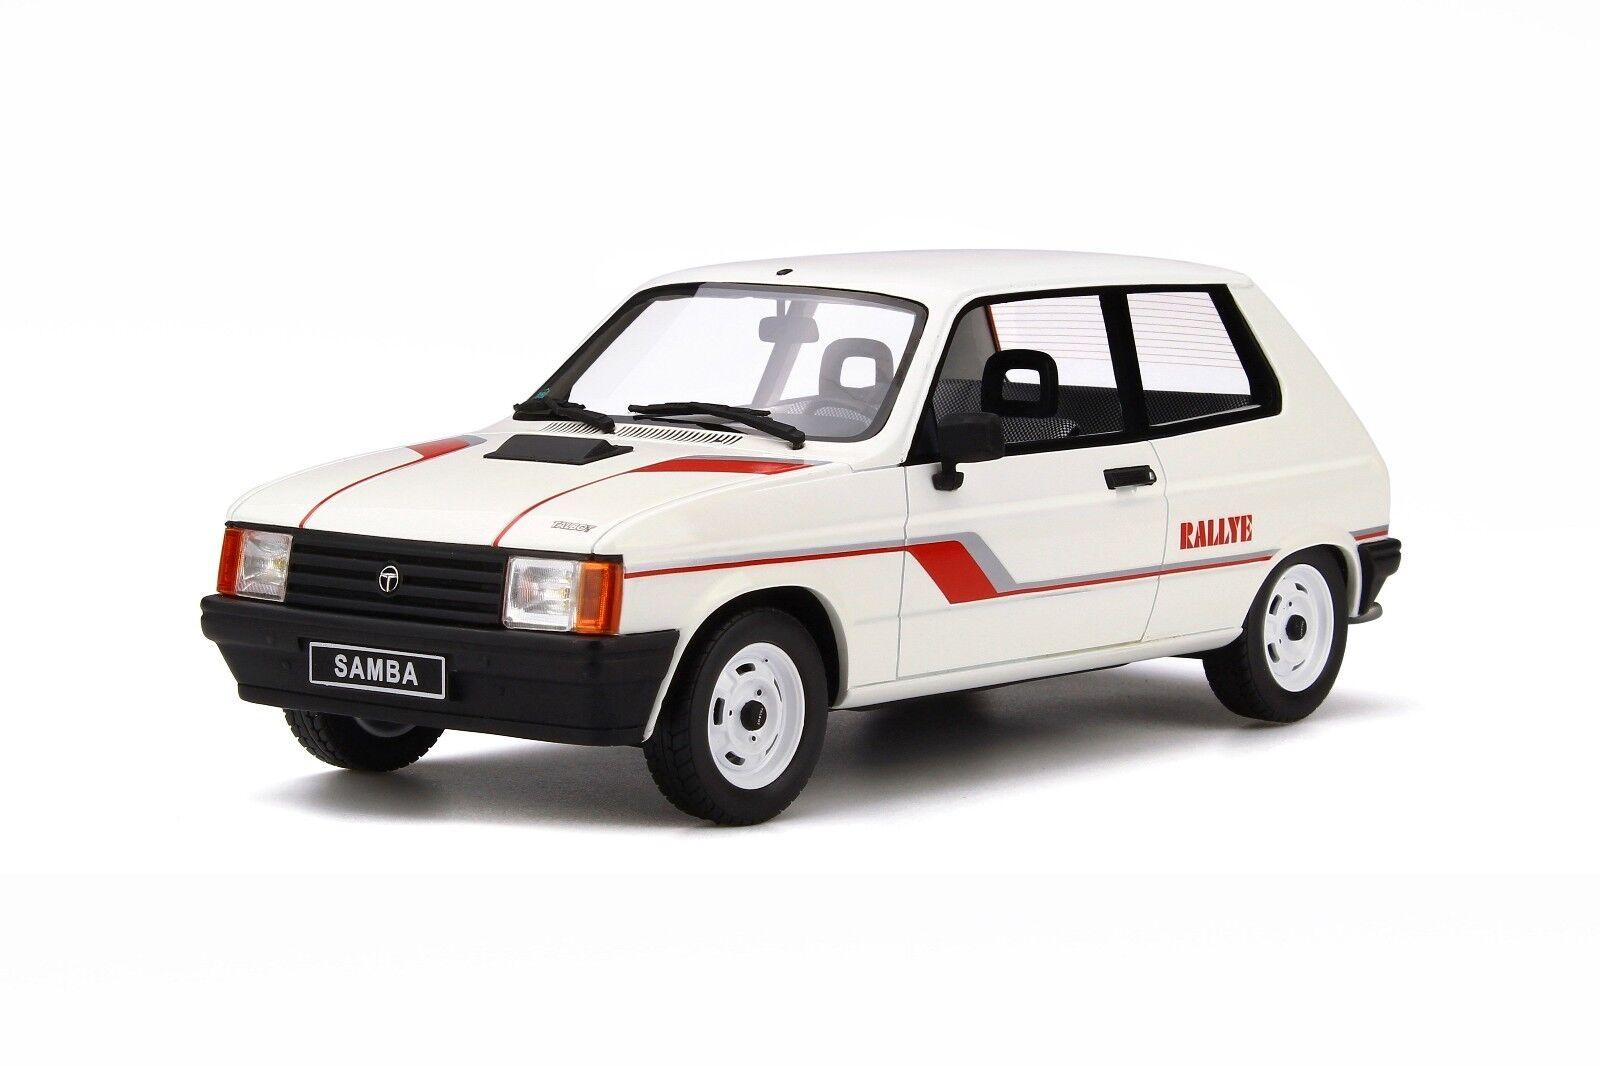 Talbot Samba Rallye  NOUVEAU  Otto ot694  1 18